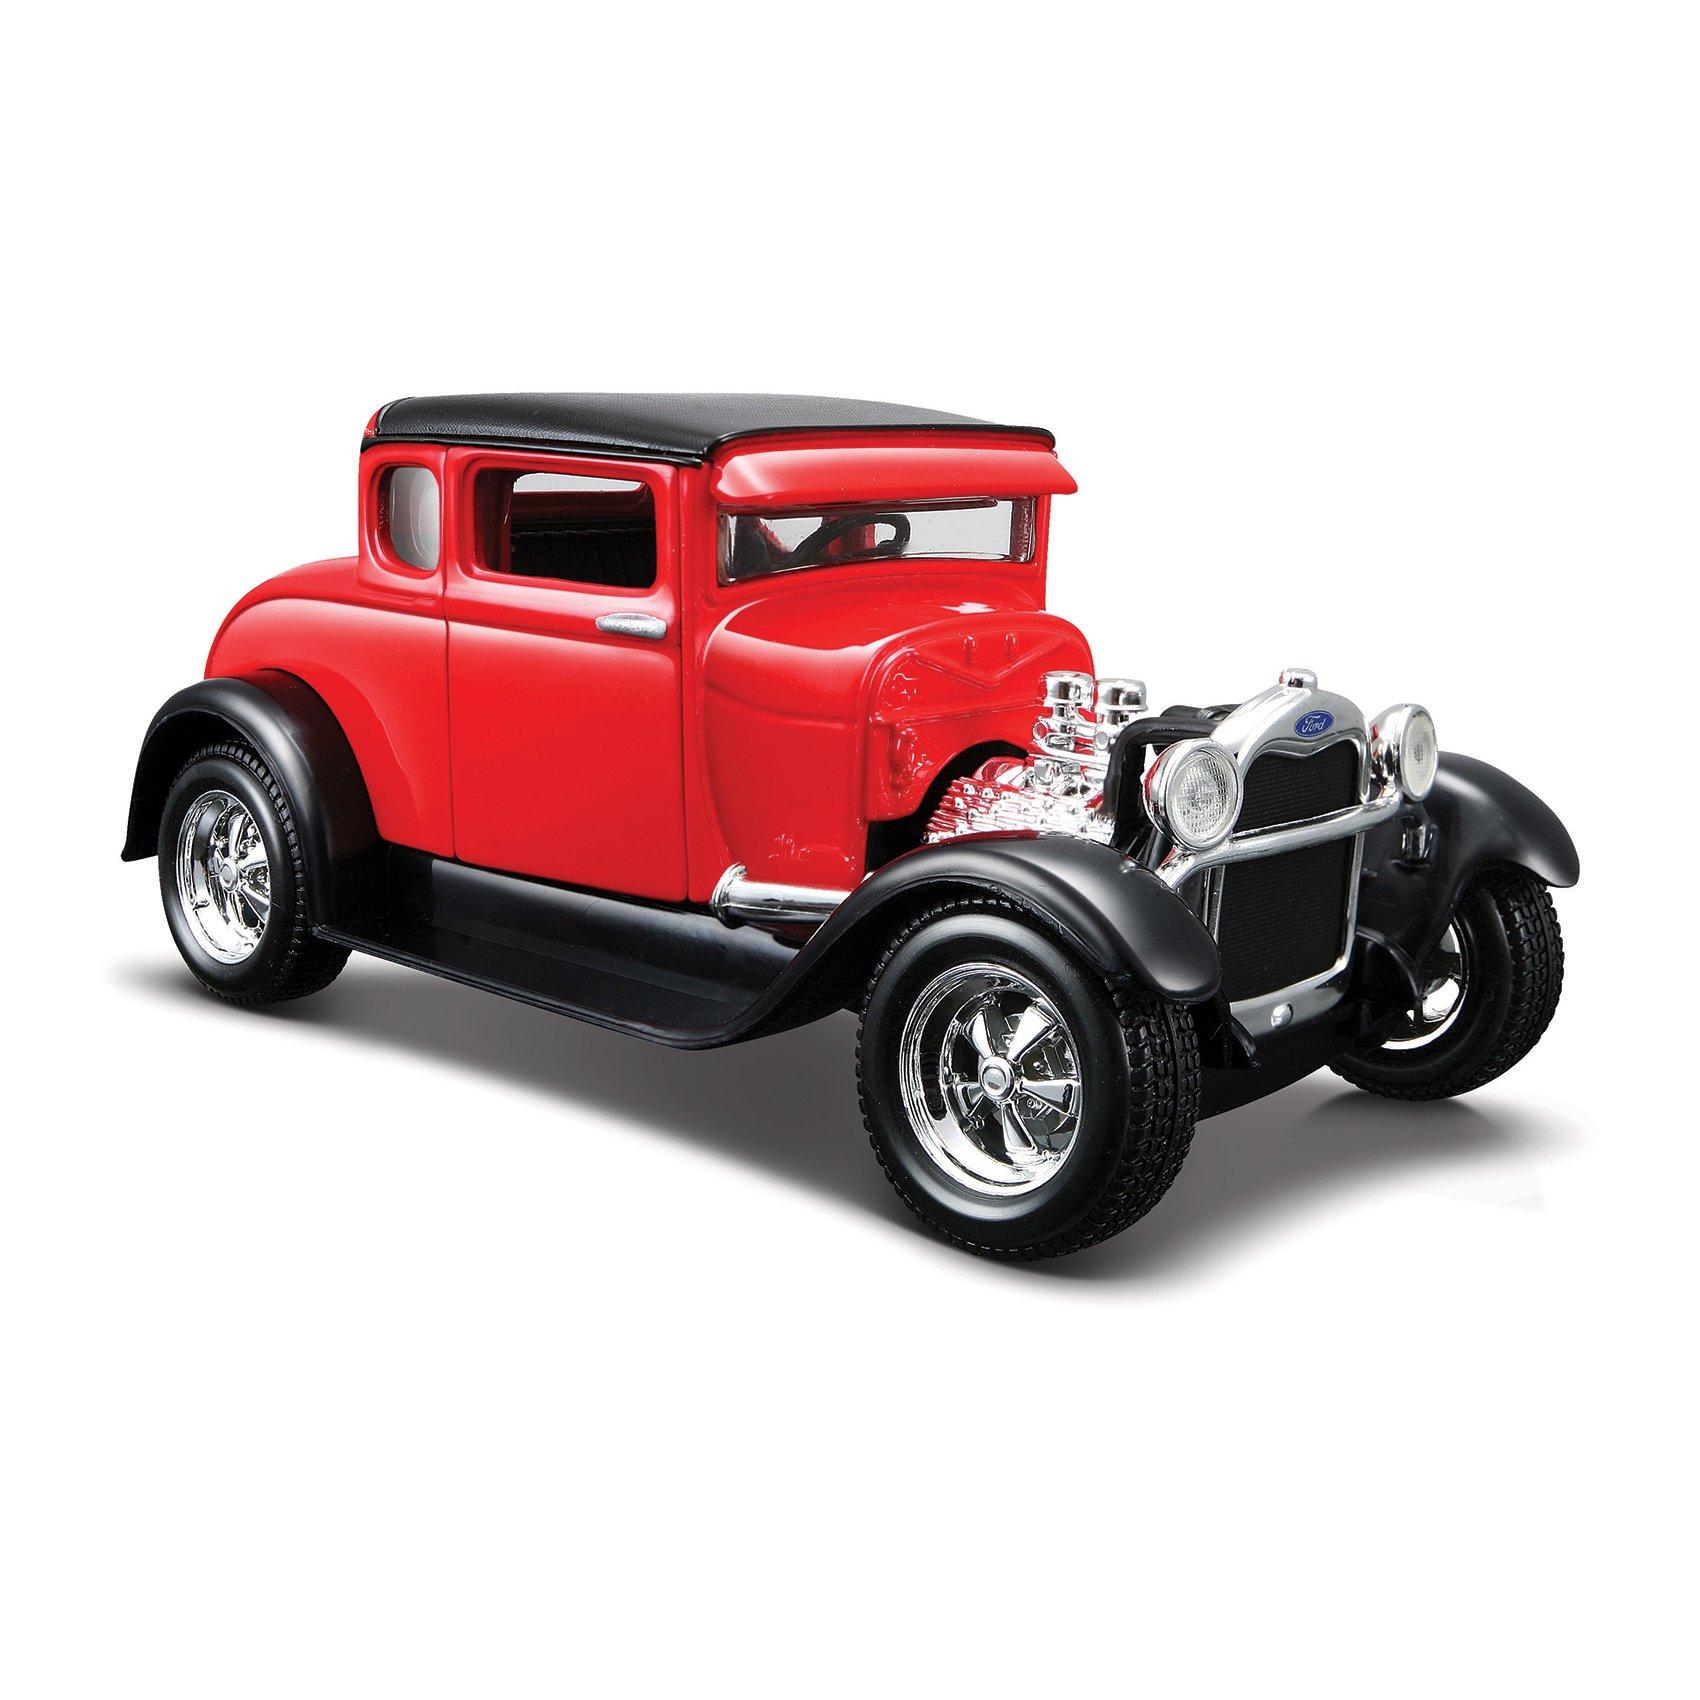 masinuta maisto ford model a 1929 1:24